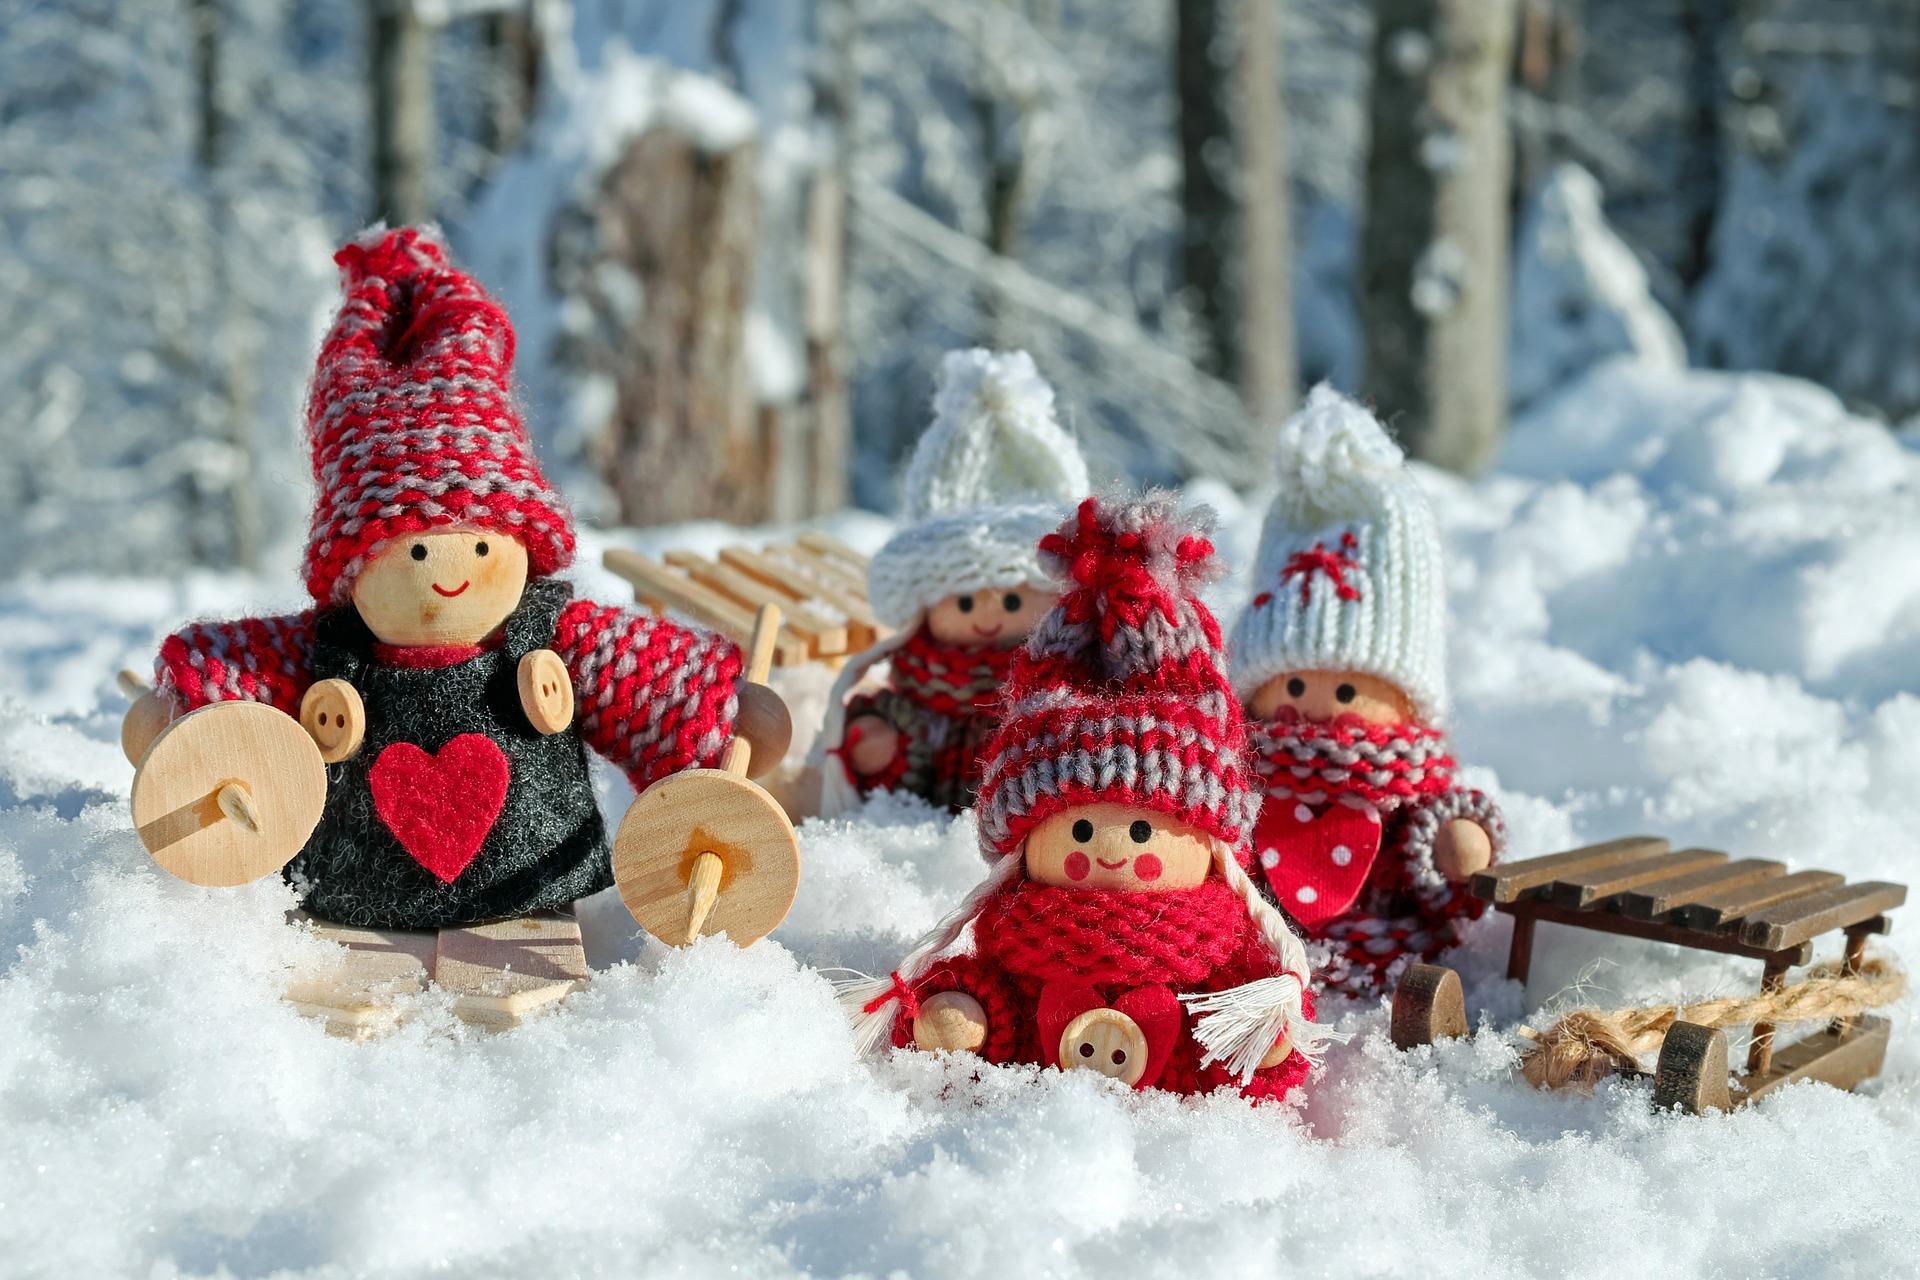 horoscop dragoste -sfatulparintilor.ro - pixabay_com - doll-figures-3015495_1920